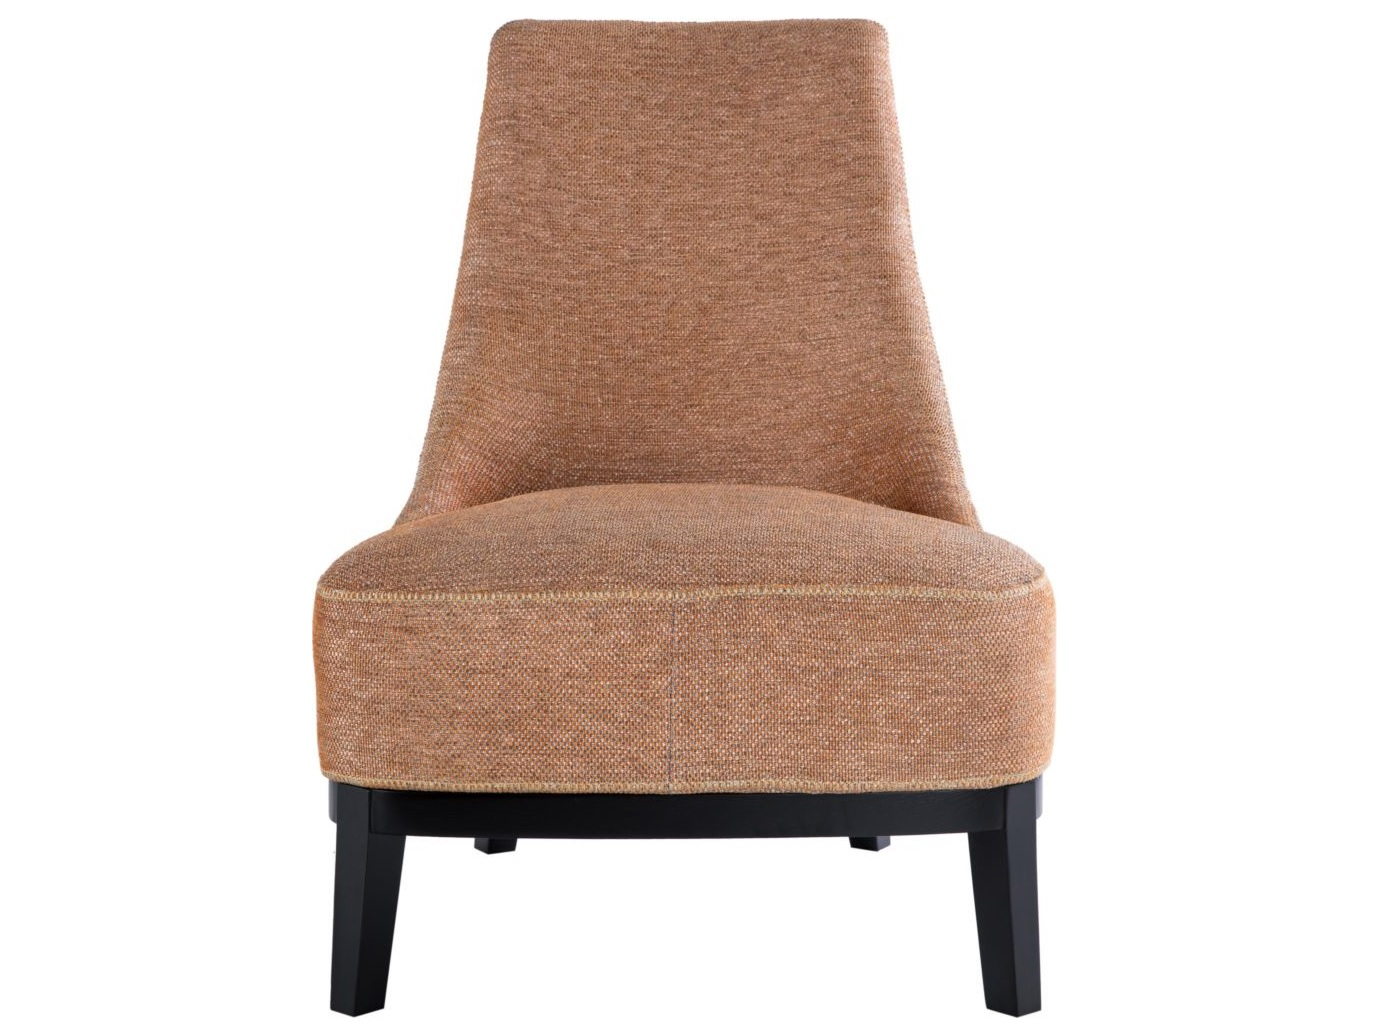 КреслоИнтерьерные кресла<br><br><br>Material: Текстиль<br>Width см: 80<br>Depth см: 68<br>Height см: 92